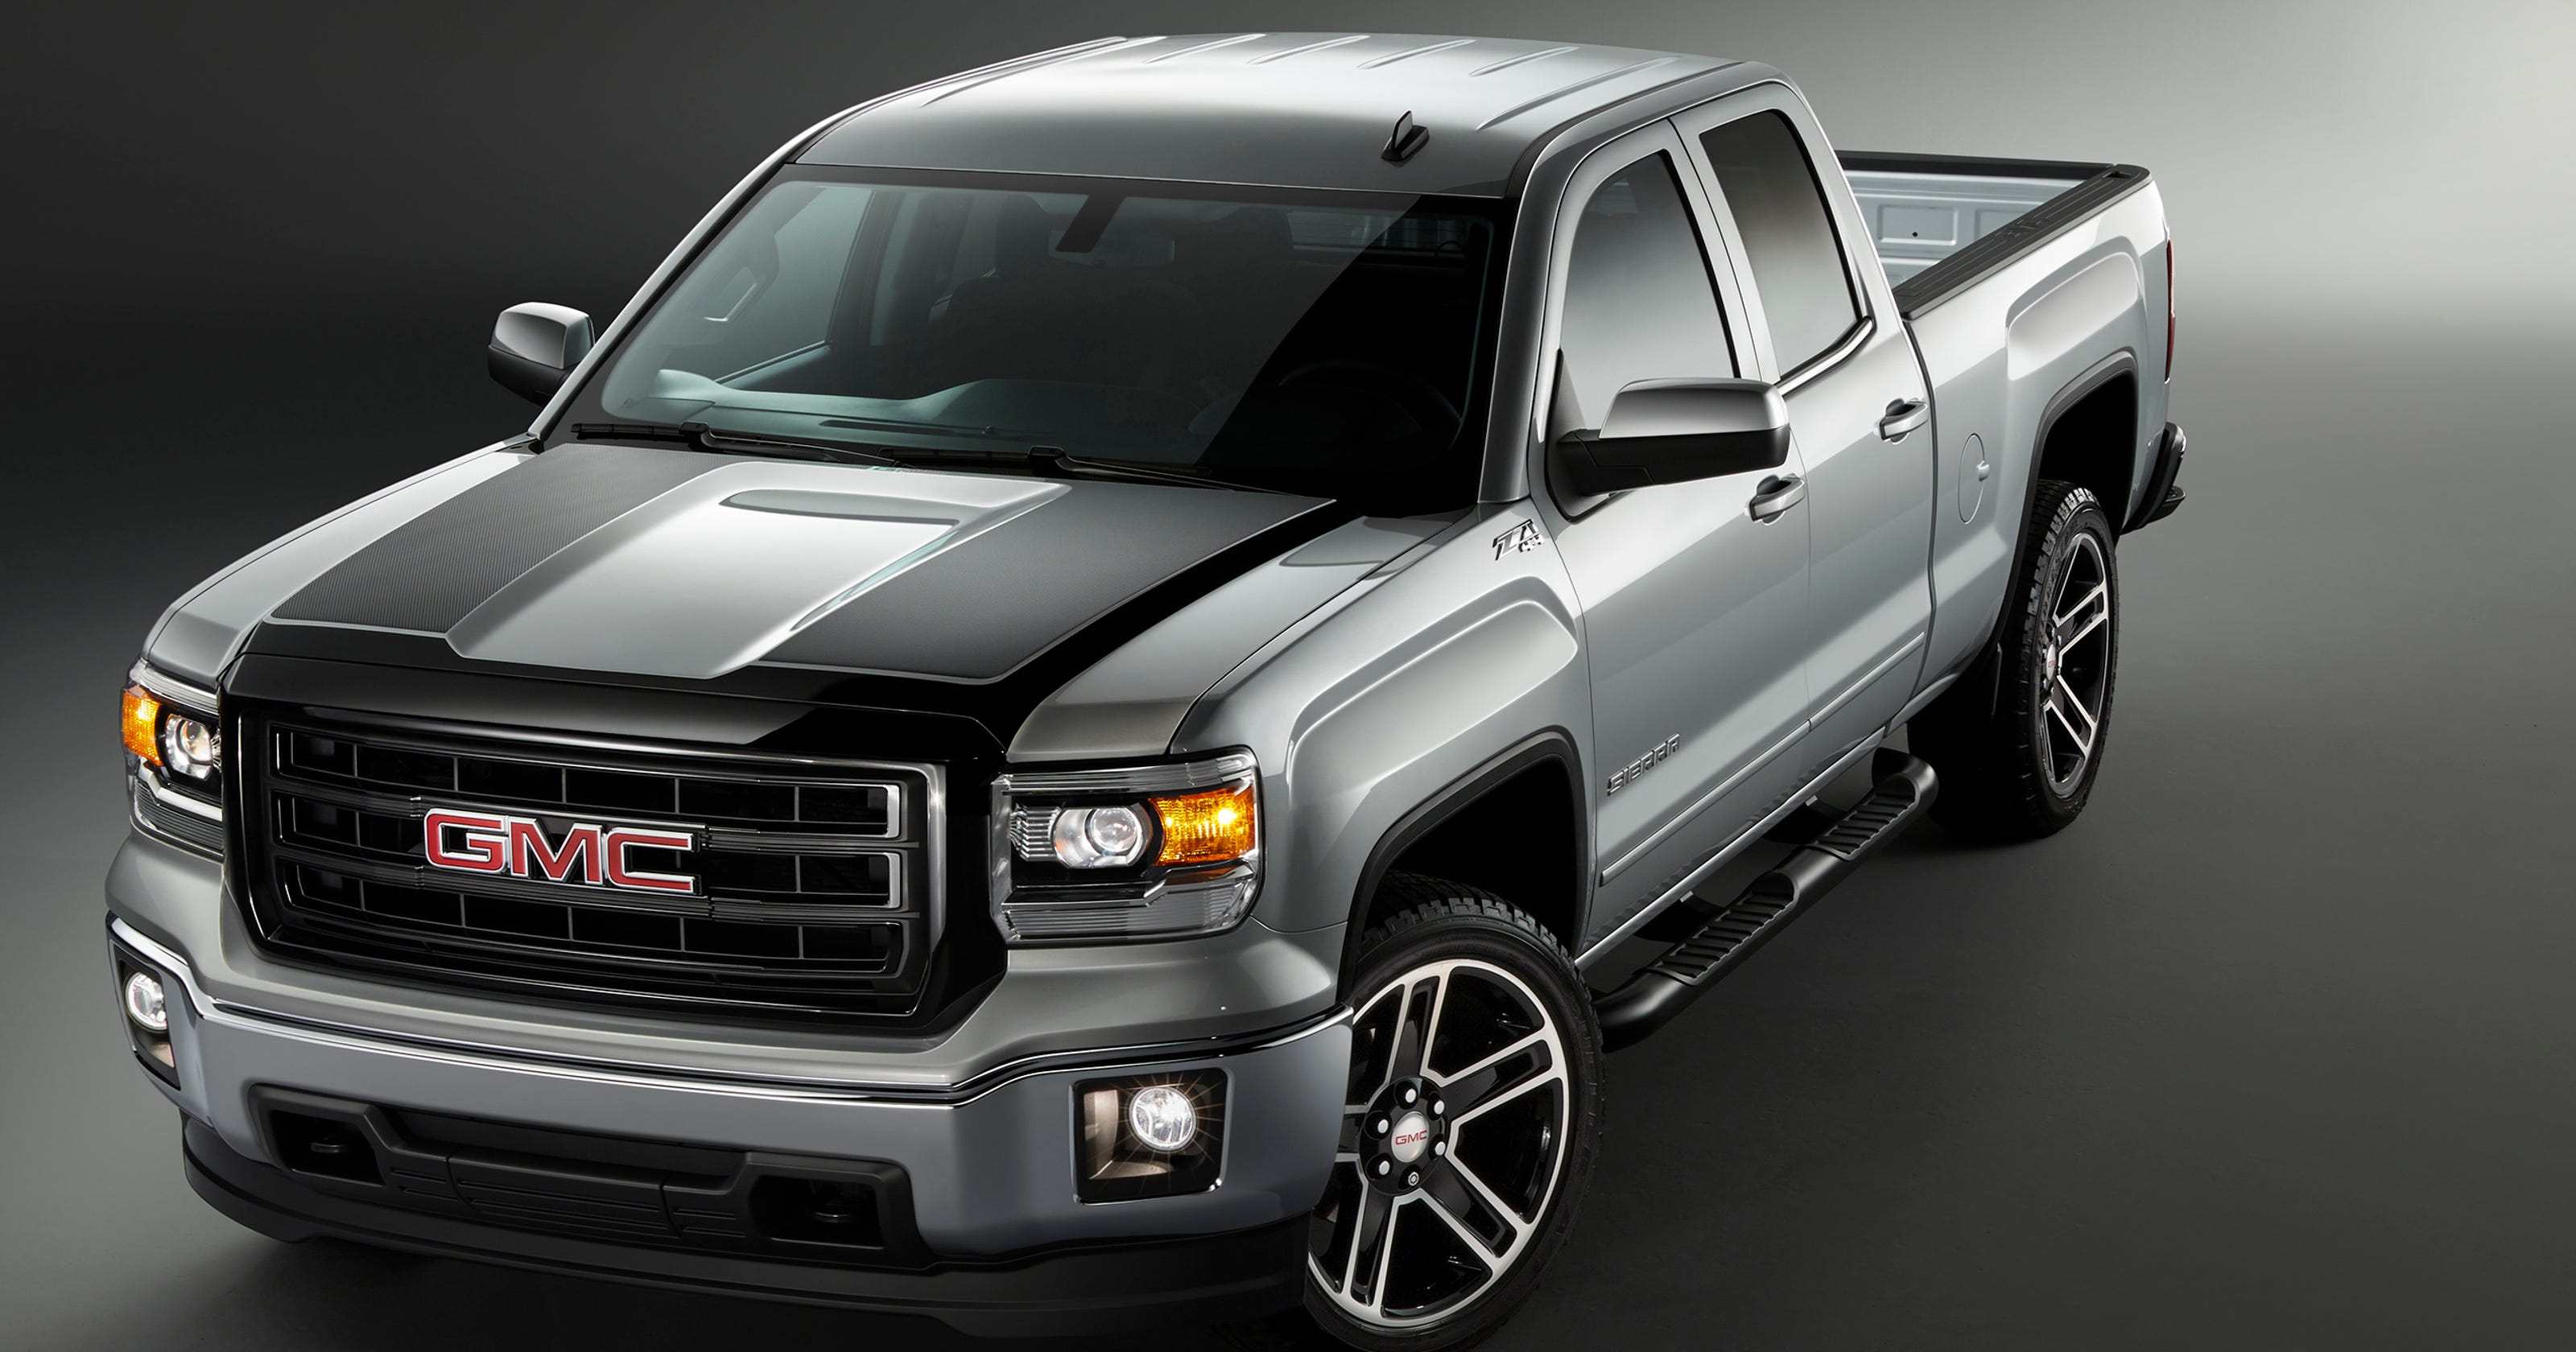 GMC creates 'carbon edition' of Sierra pickup